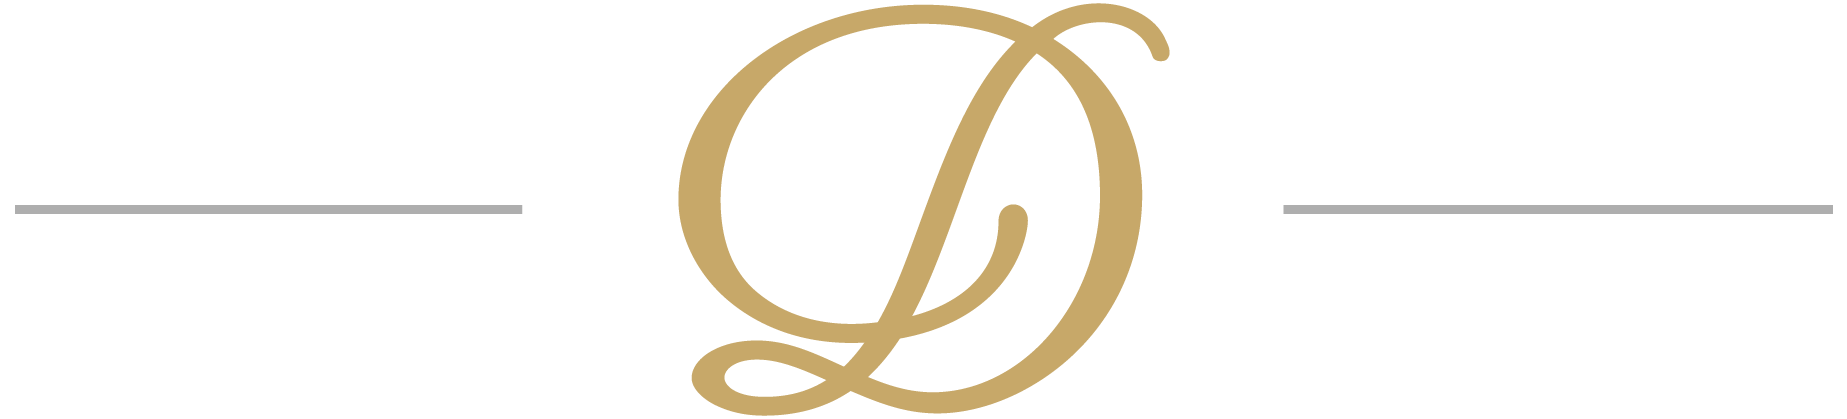 DiCarlo-Logo-Page-Header-Lrg-2